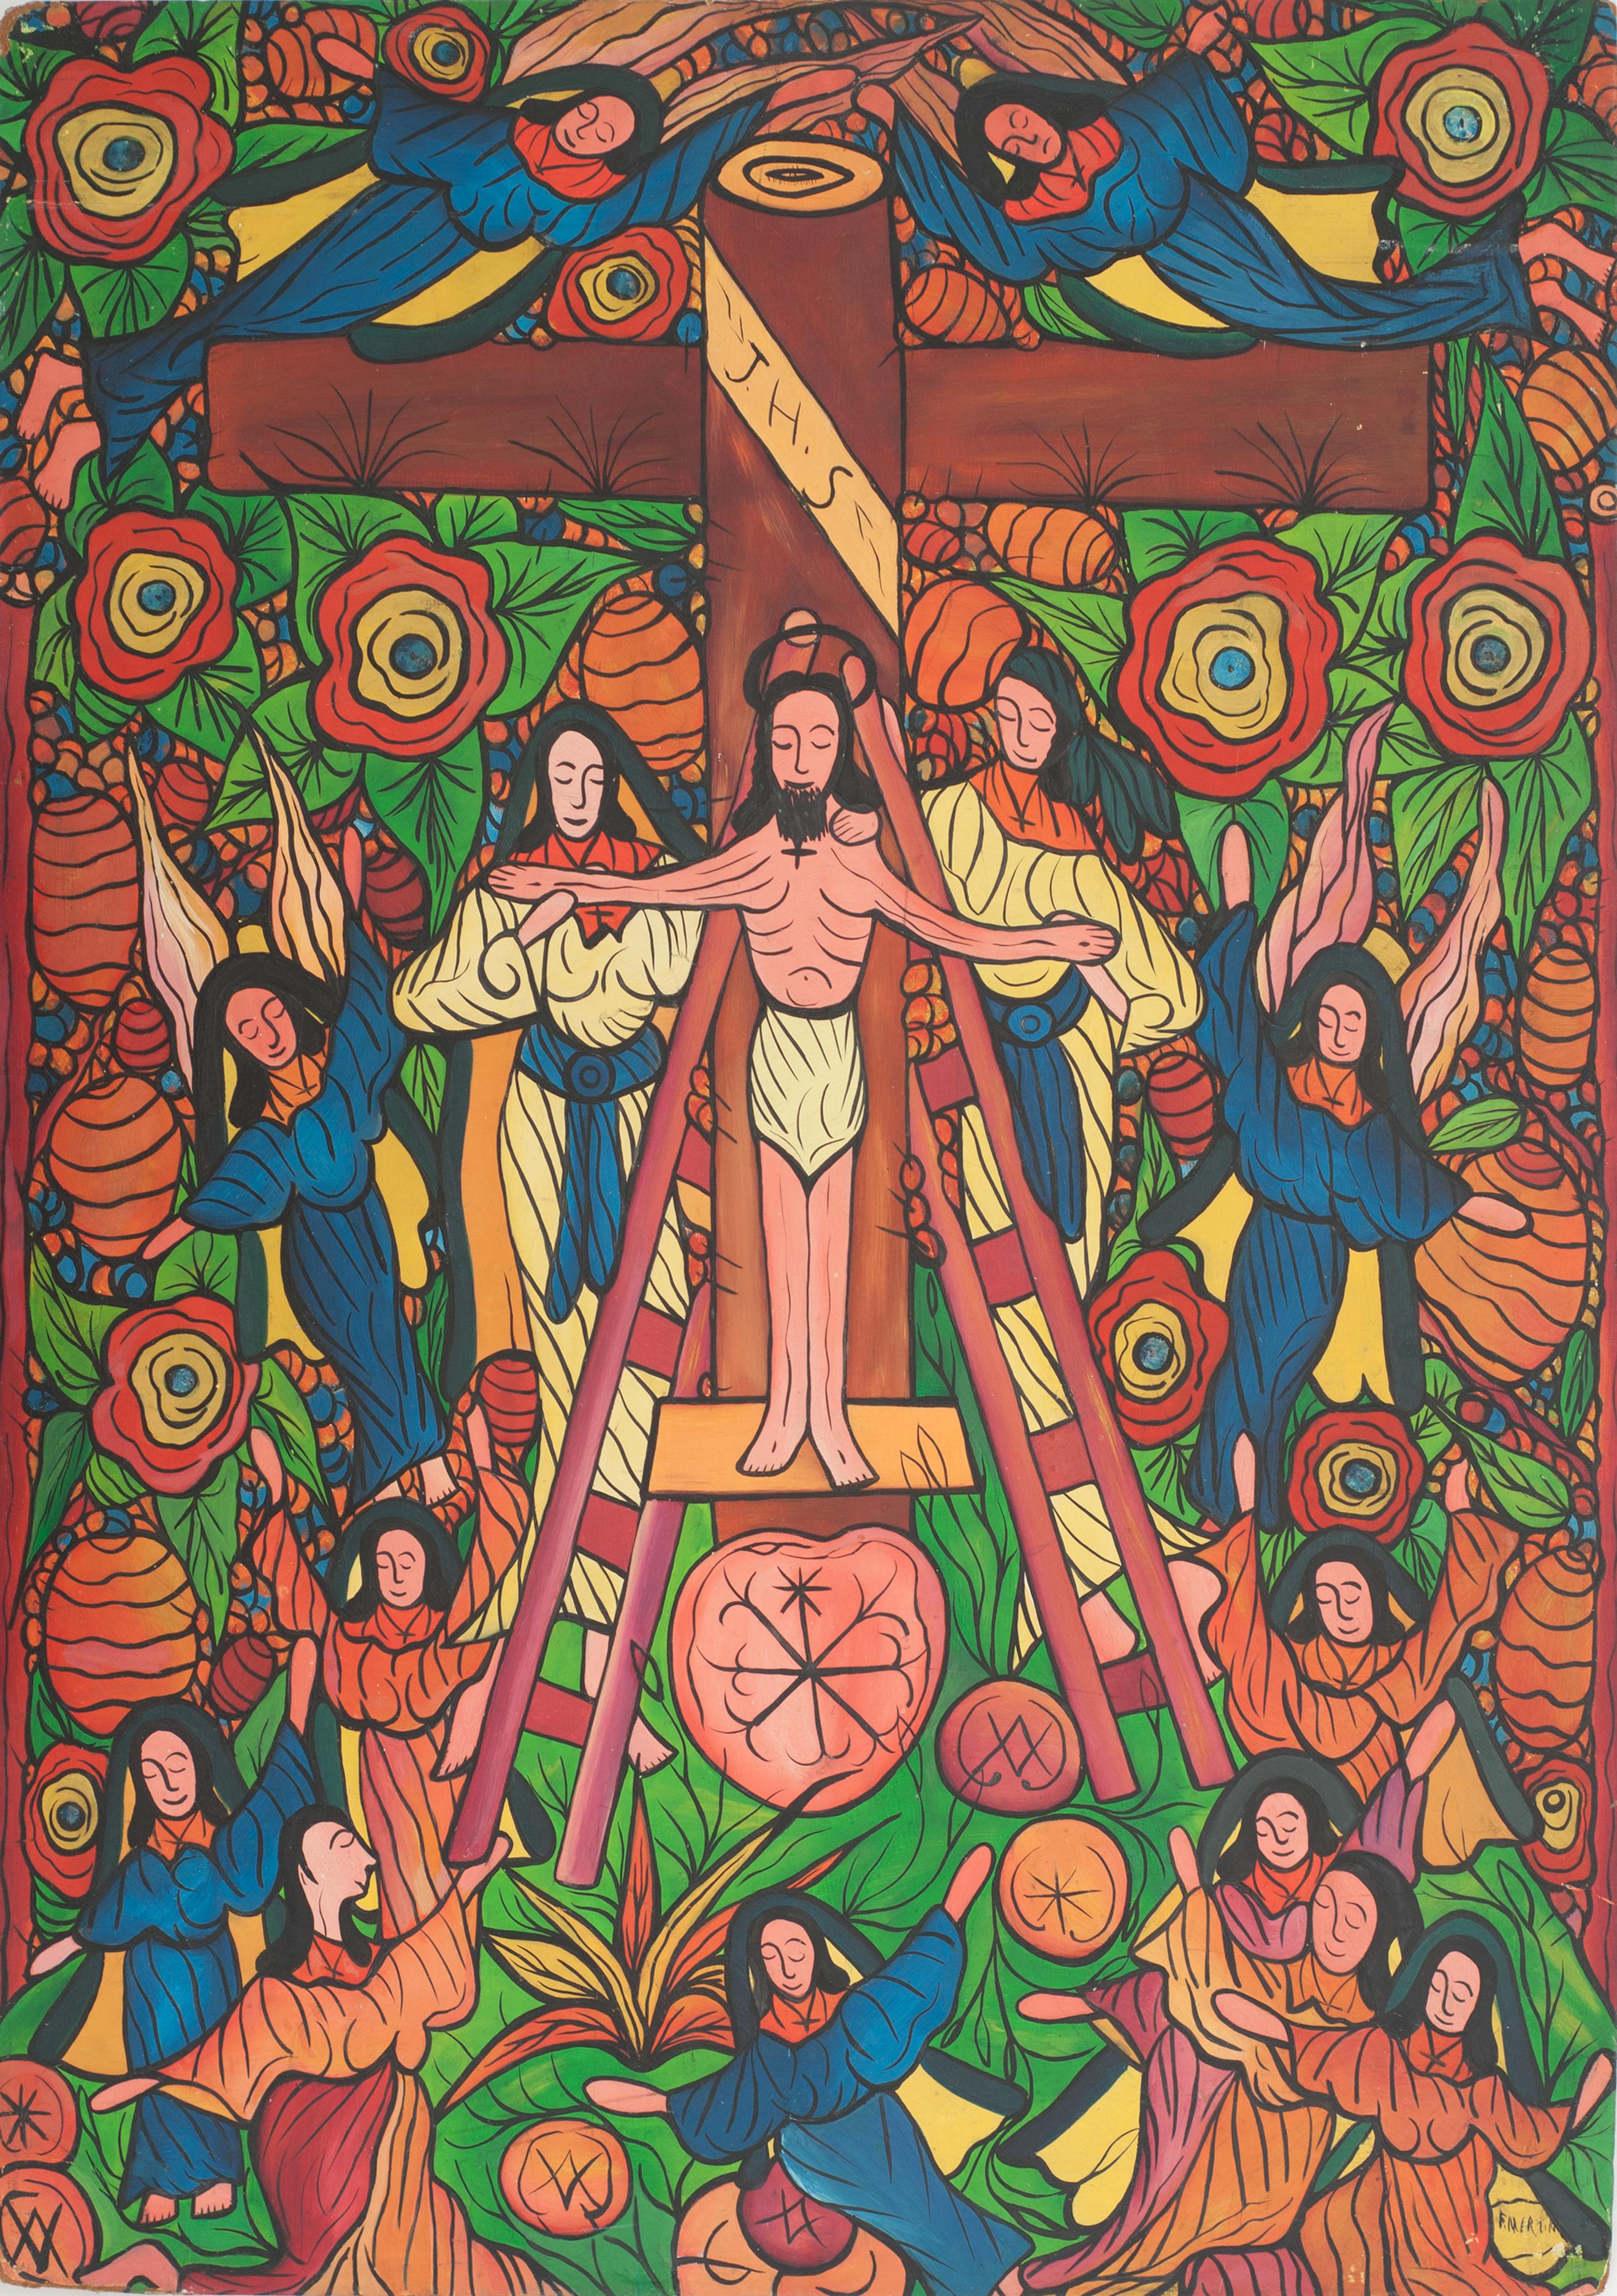 Martinez Florence 32X22 1:2 #1-6-91 Boar